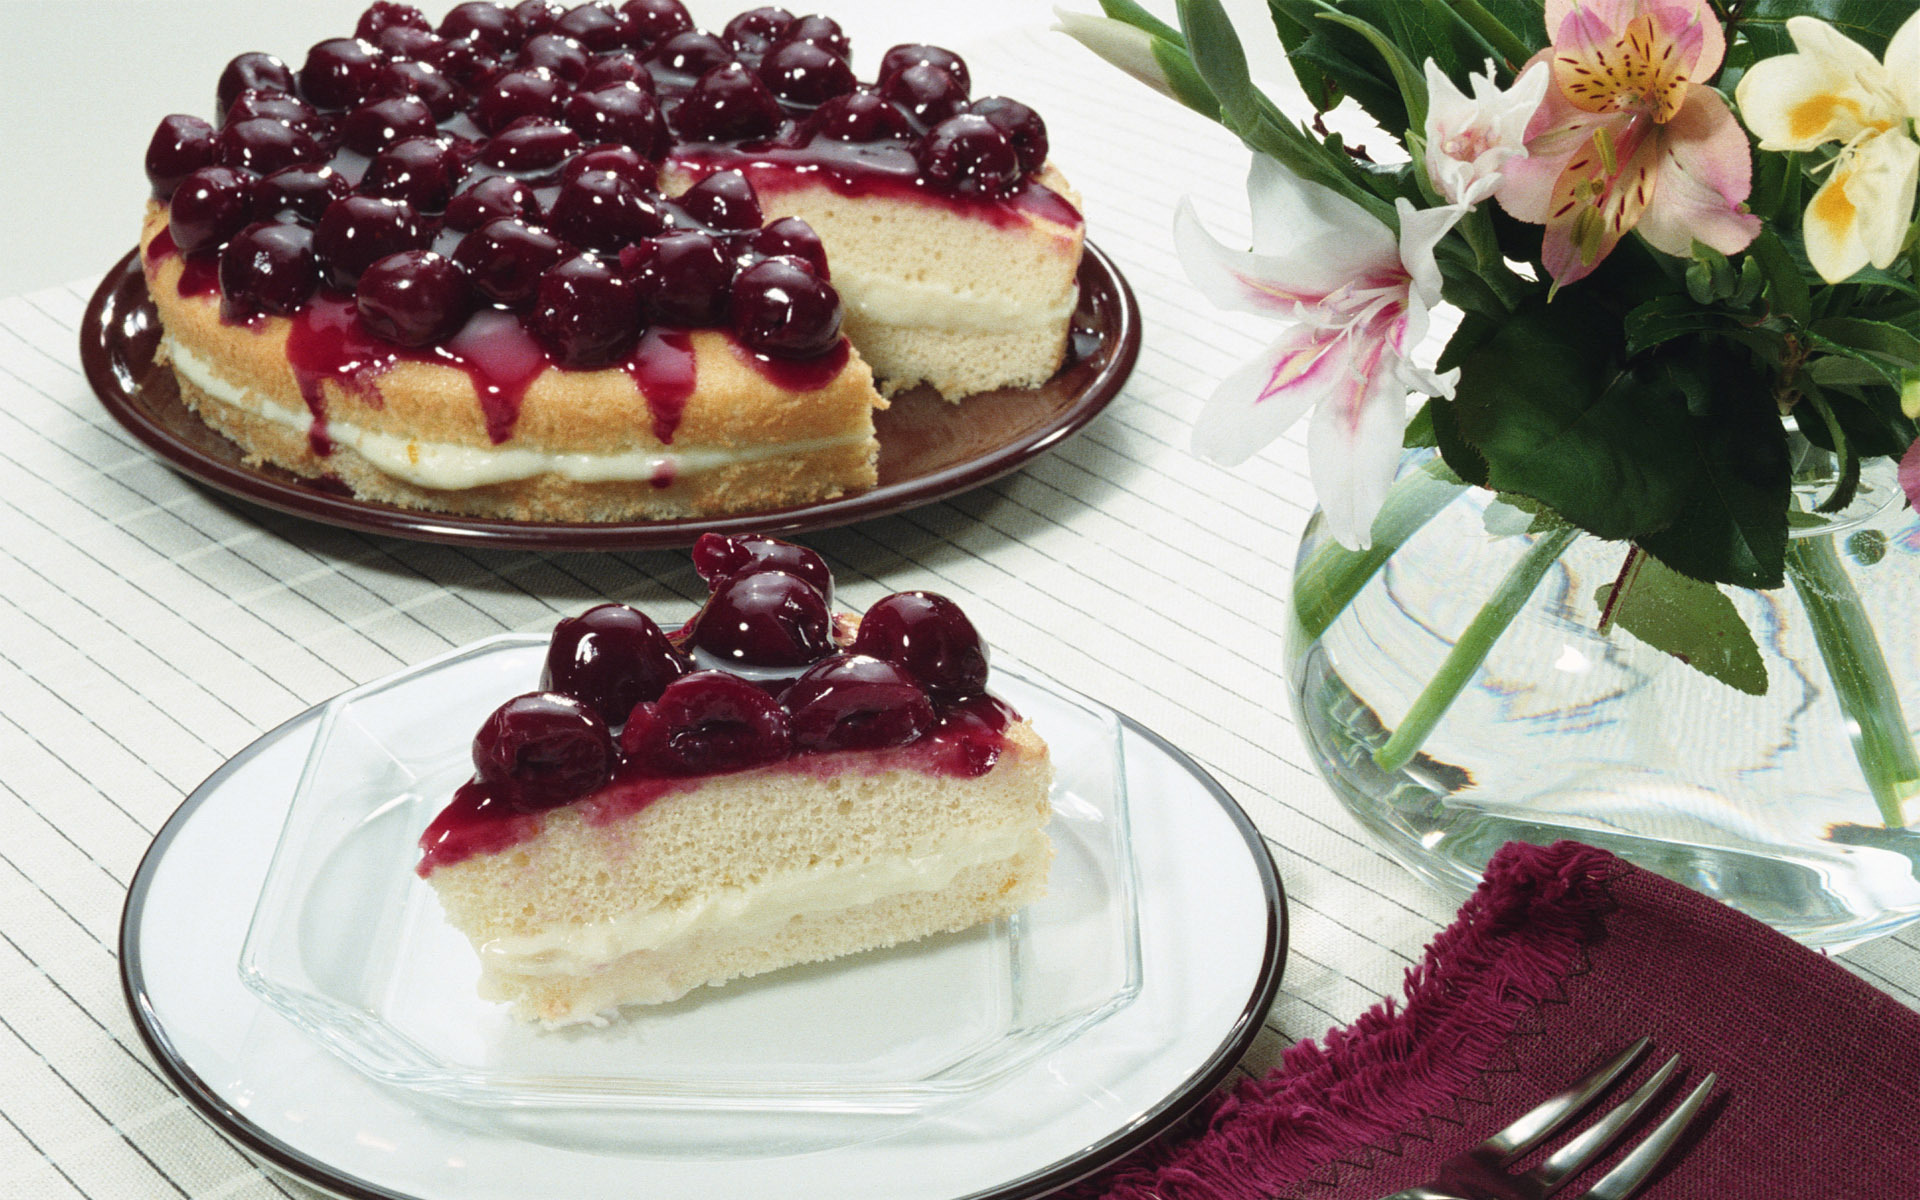 торт пирог  № 1406568 без смс